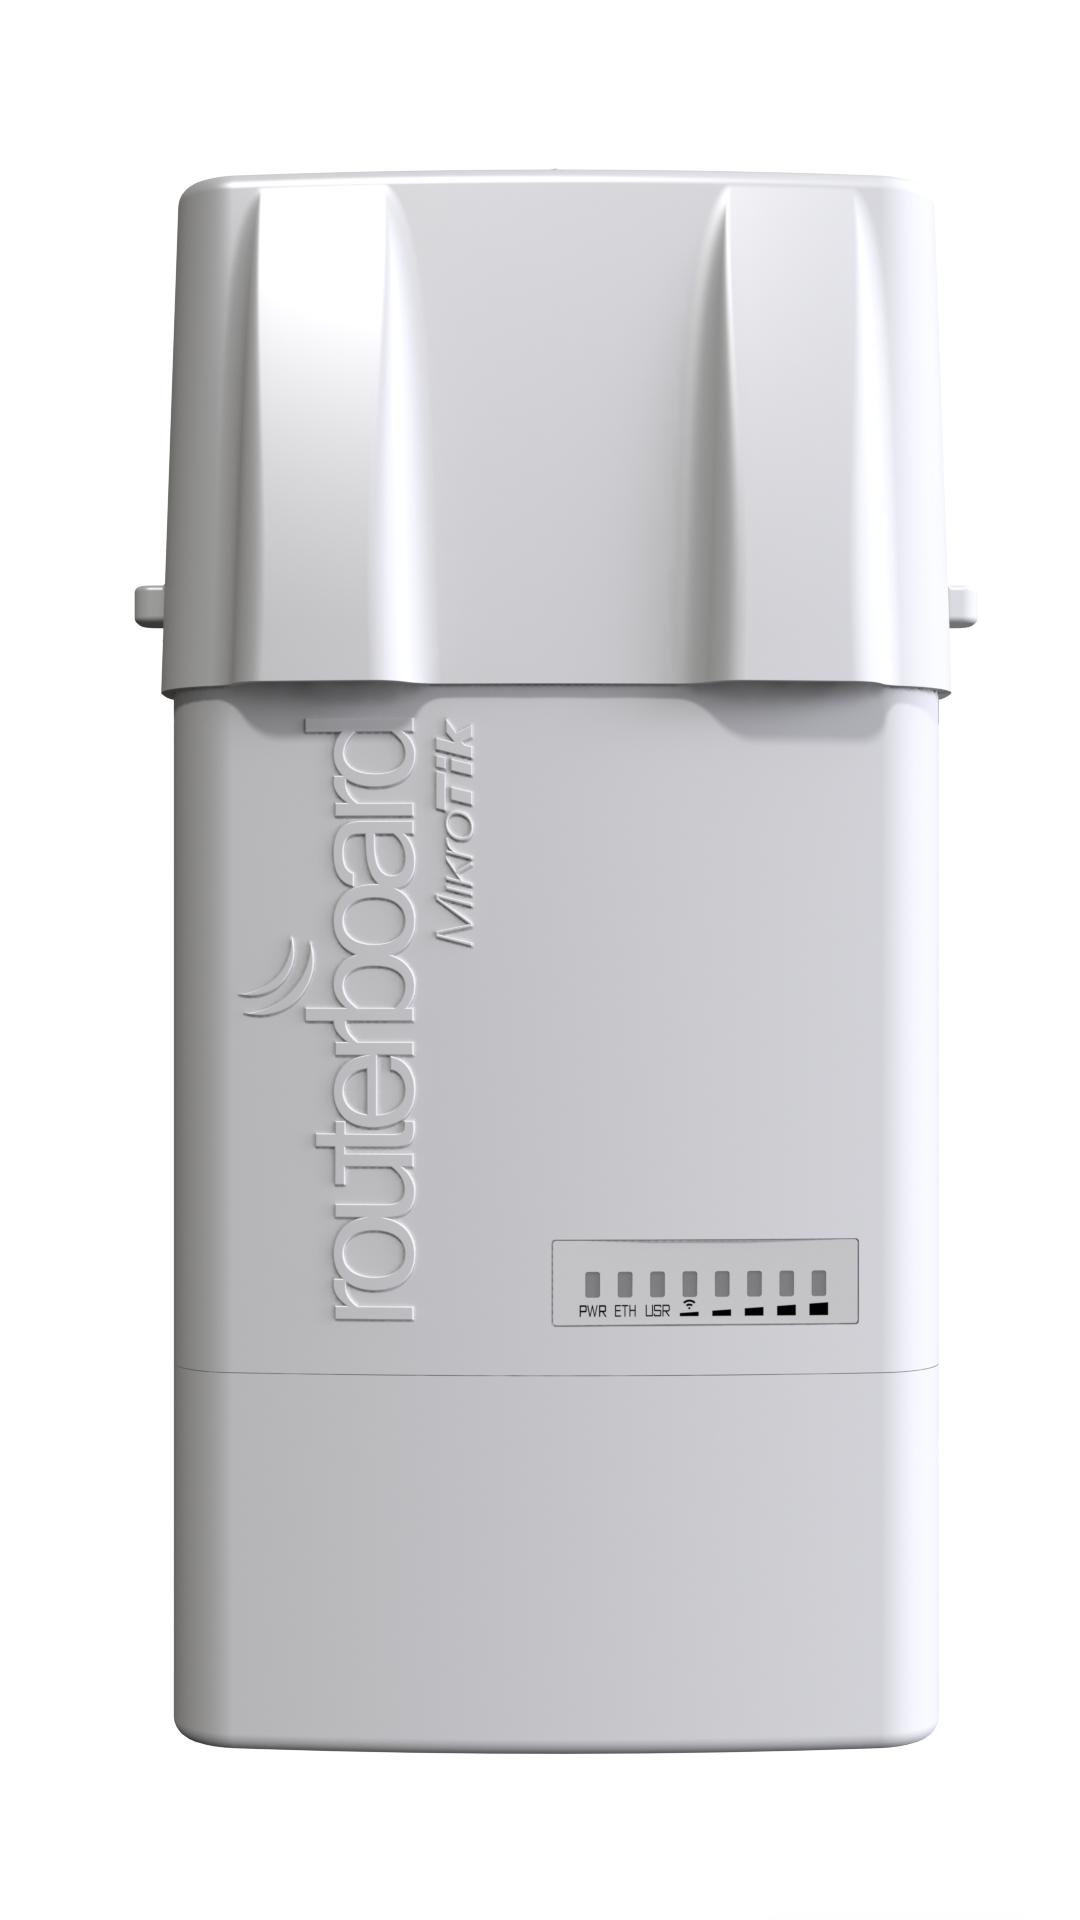 Mikrotik BaseBox 2 Power over Ethernet (PoE) Grey WLAN access point